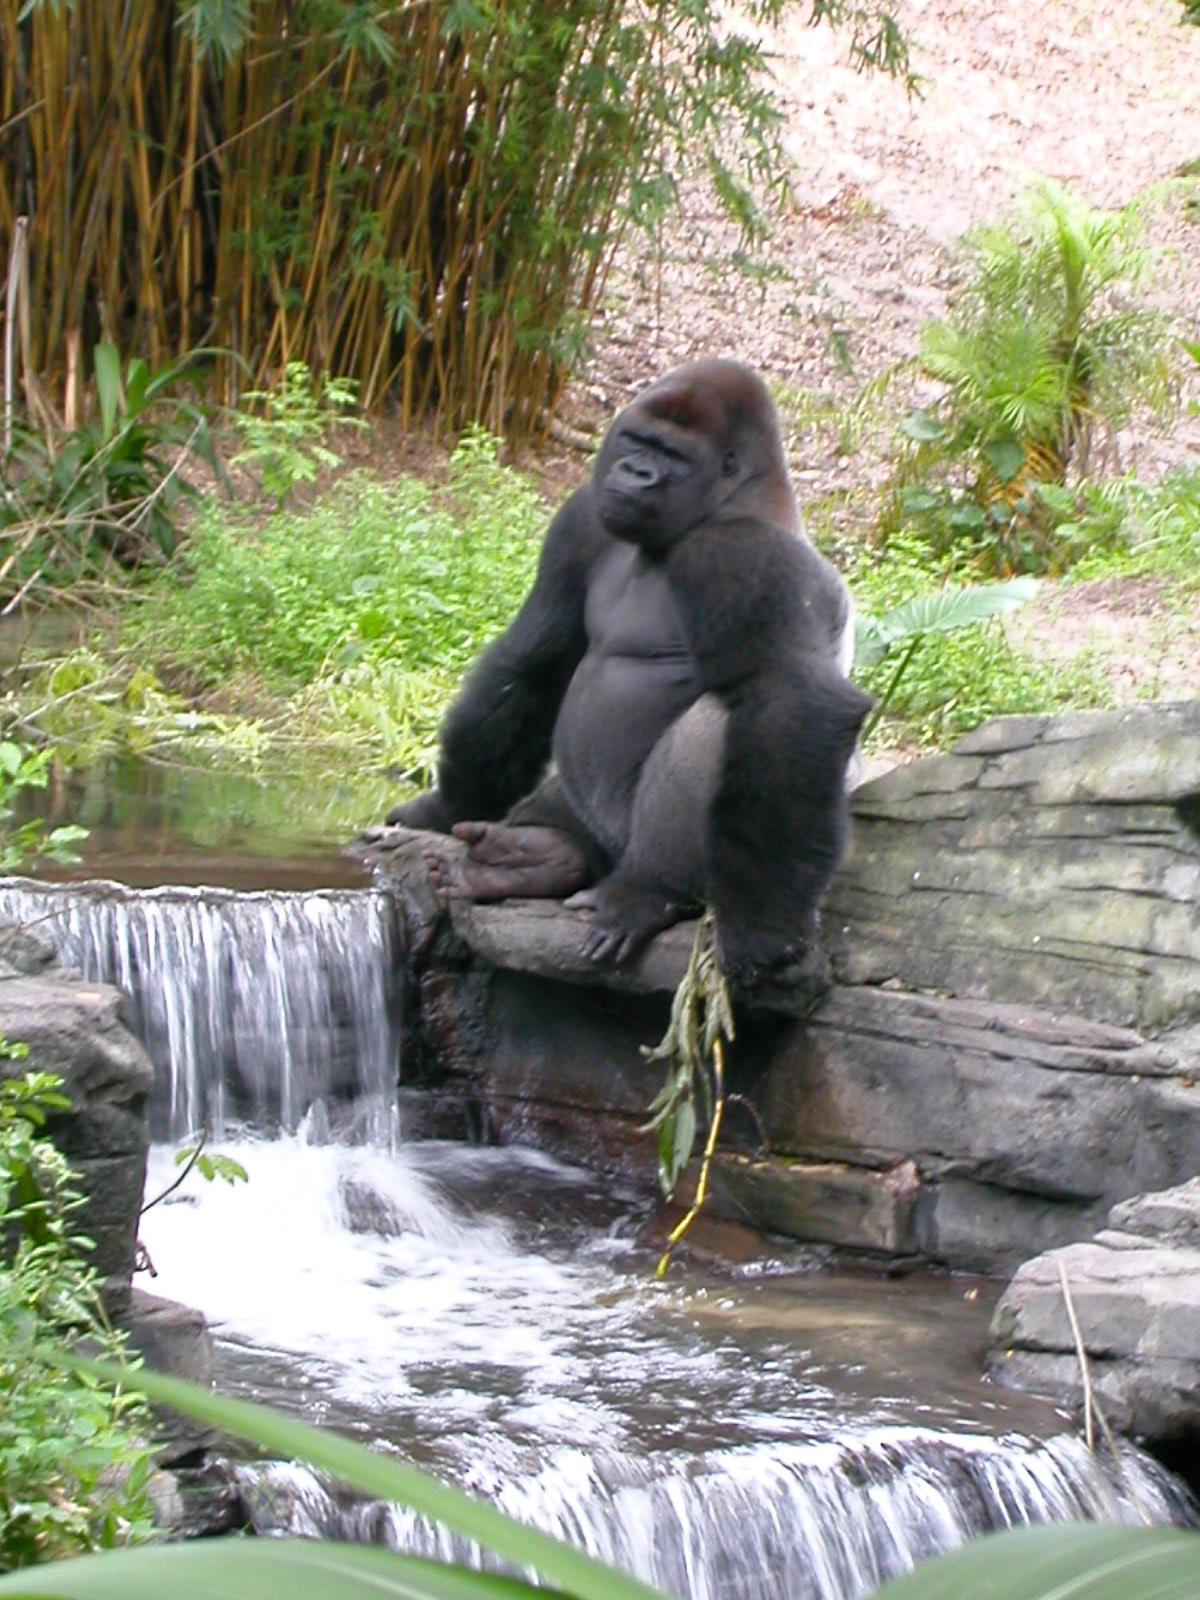 Relaxing Ape